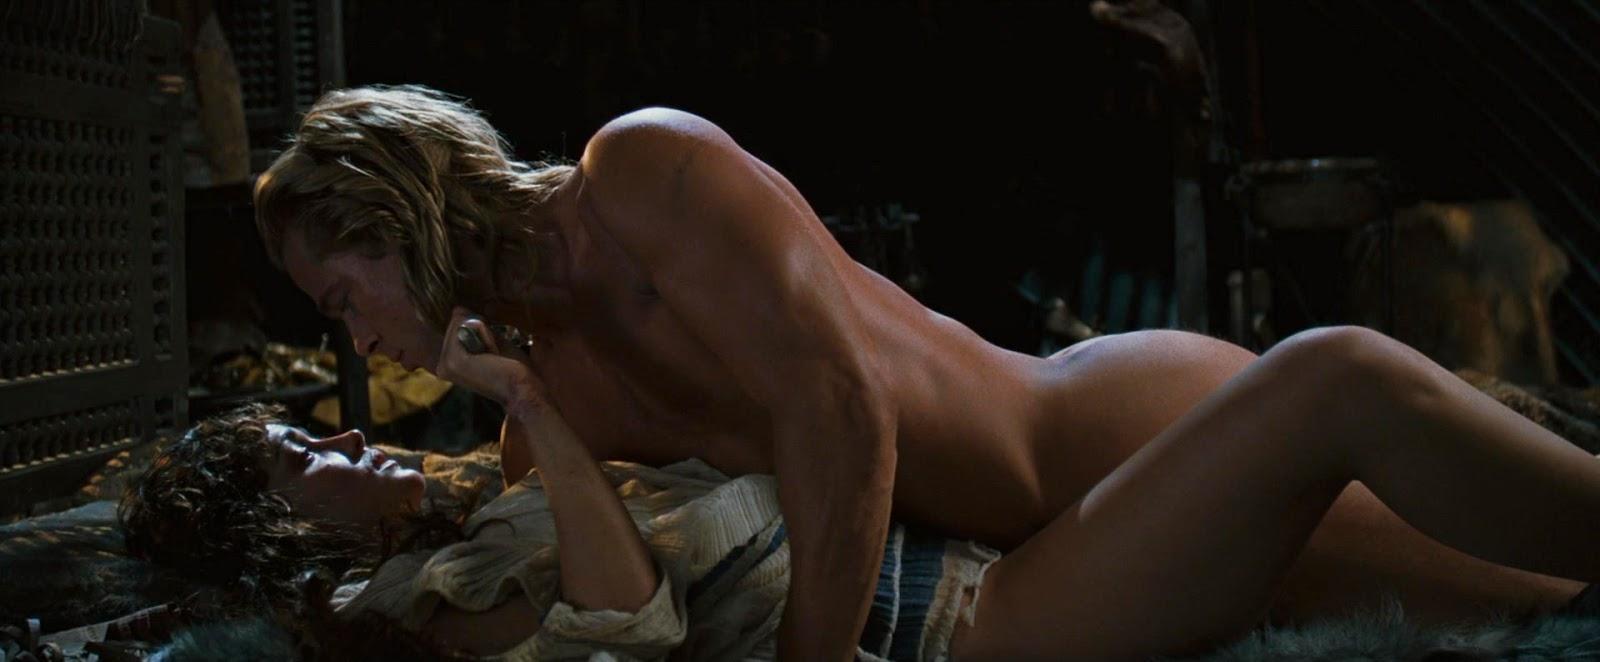 Troy topless scene, leah jaye naked